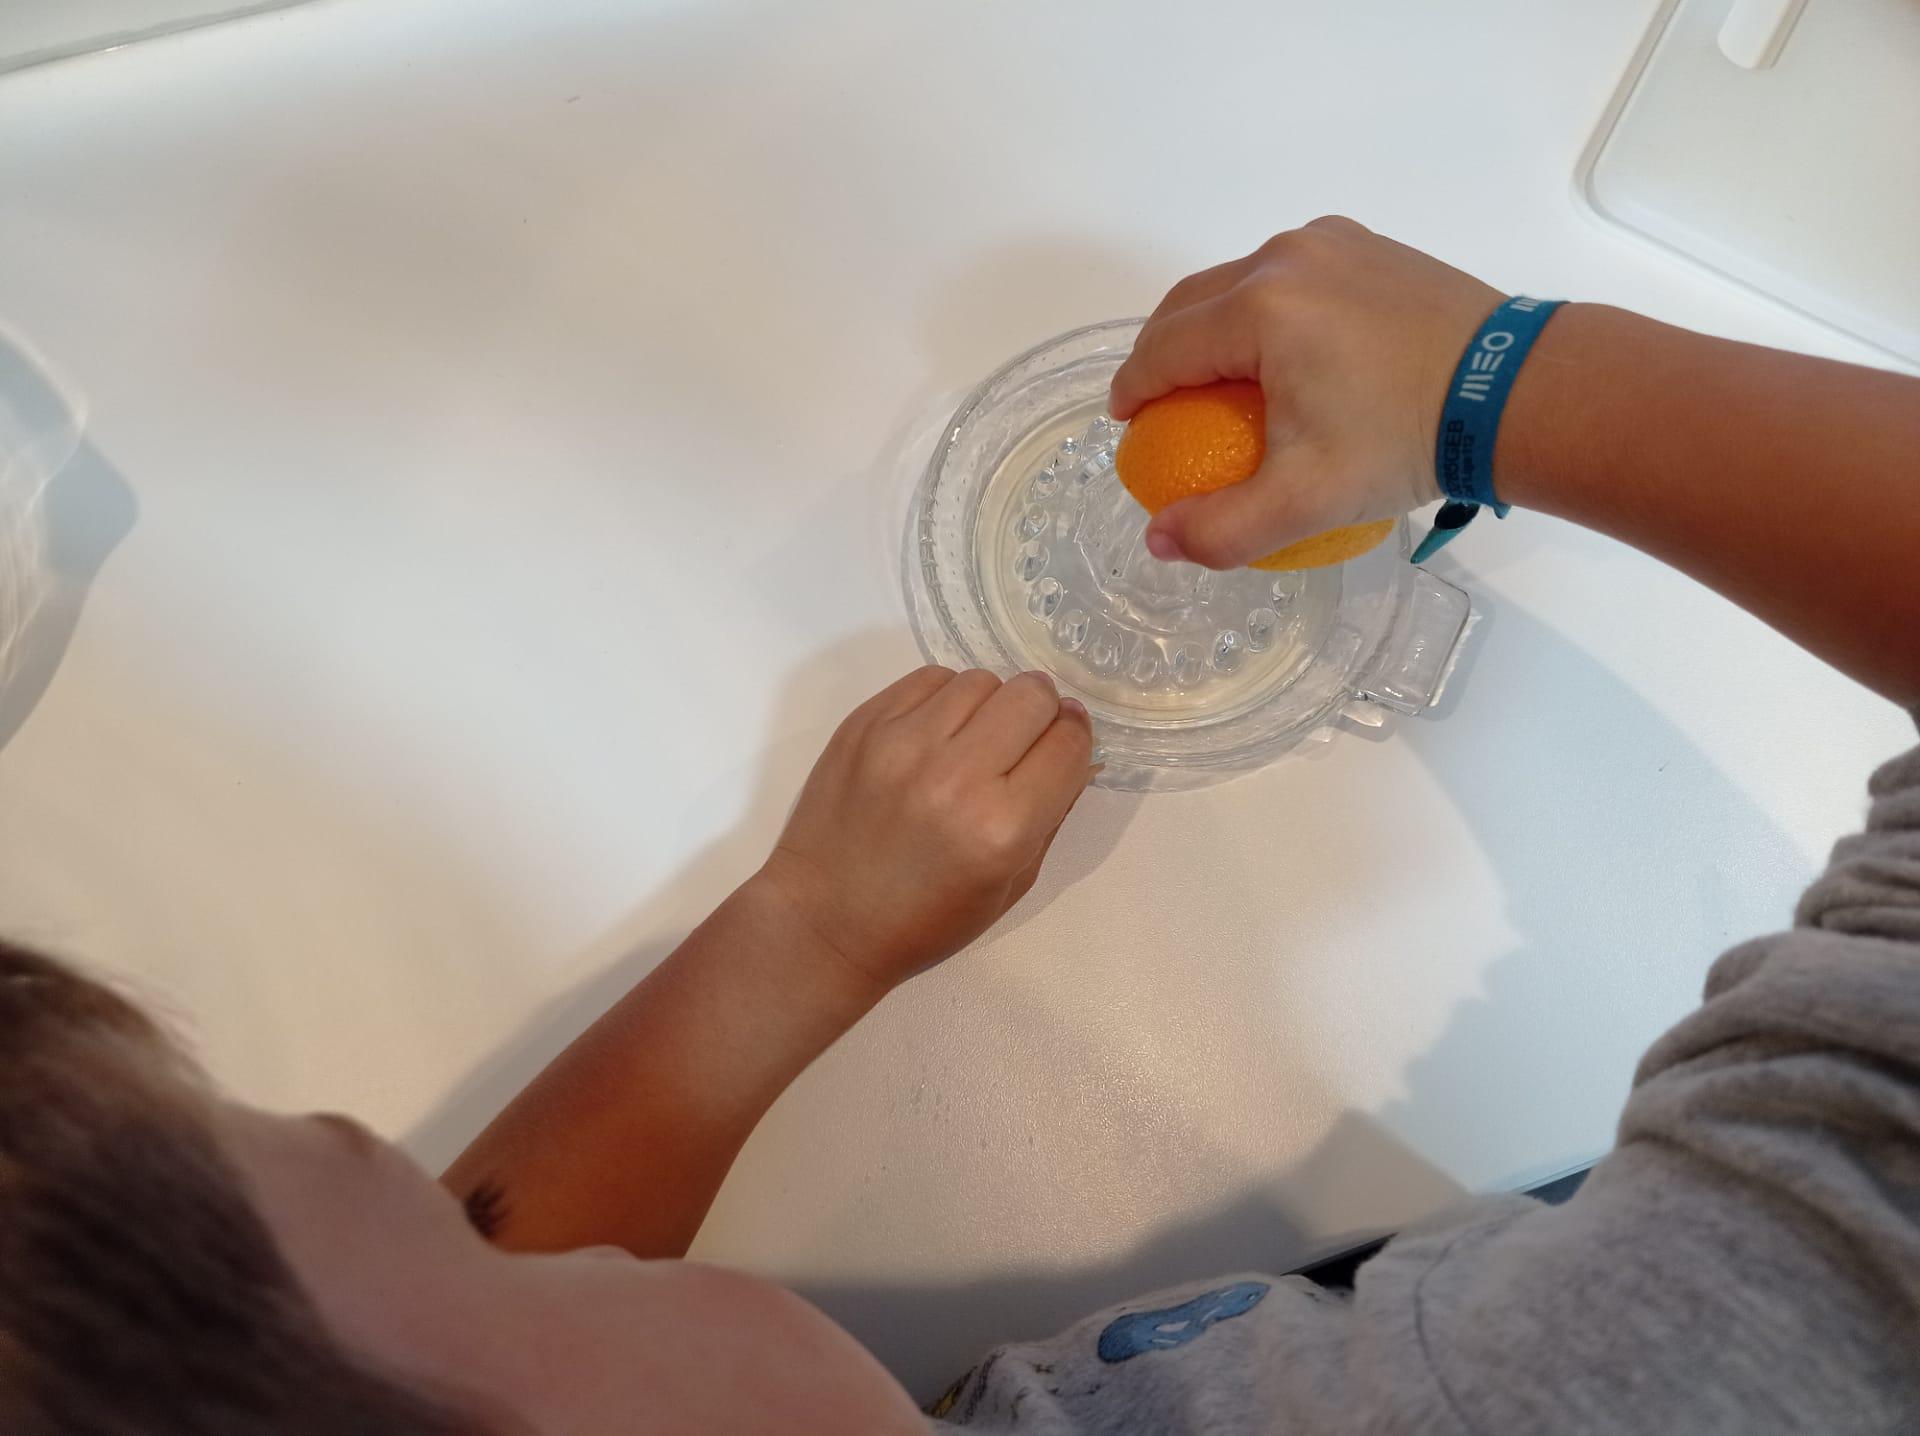 Espremer as laranjas